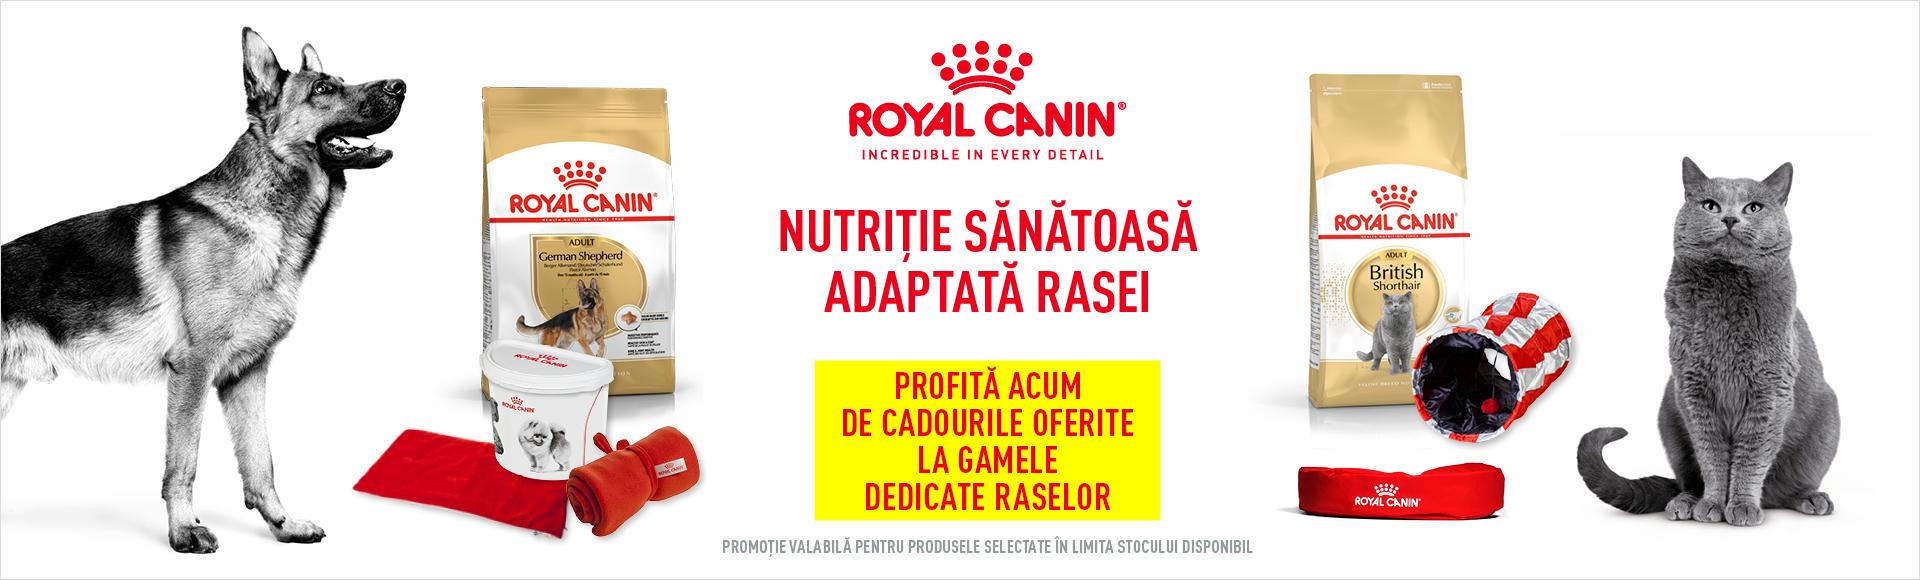 Cadouri Royal Canin